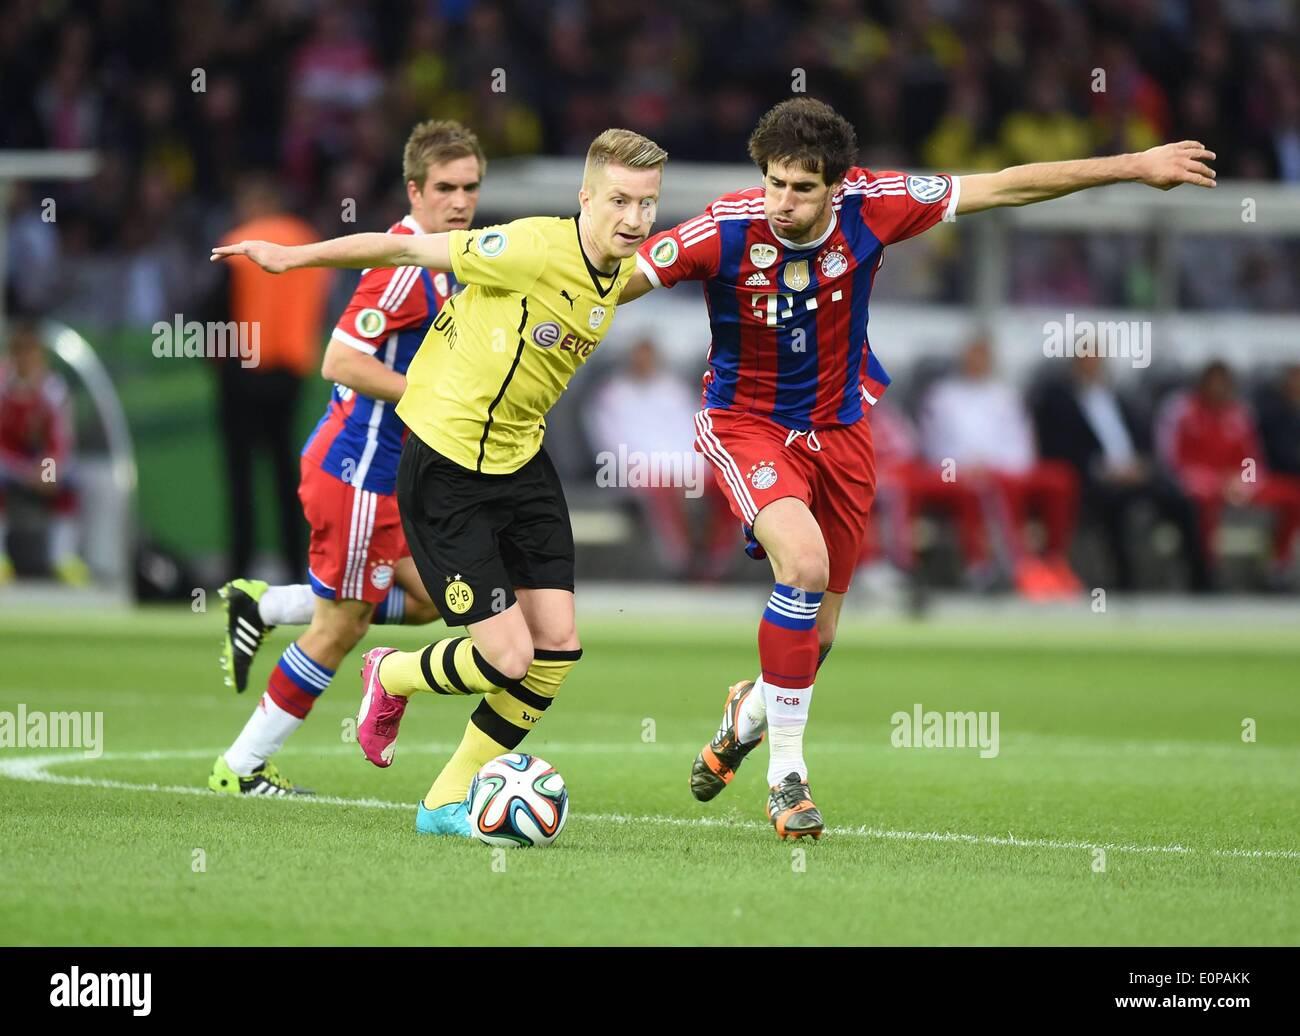 REWE EM 2016 DFB Jimmie 21 Marco Reus